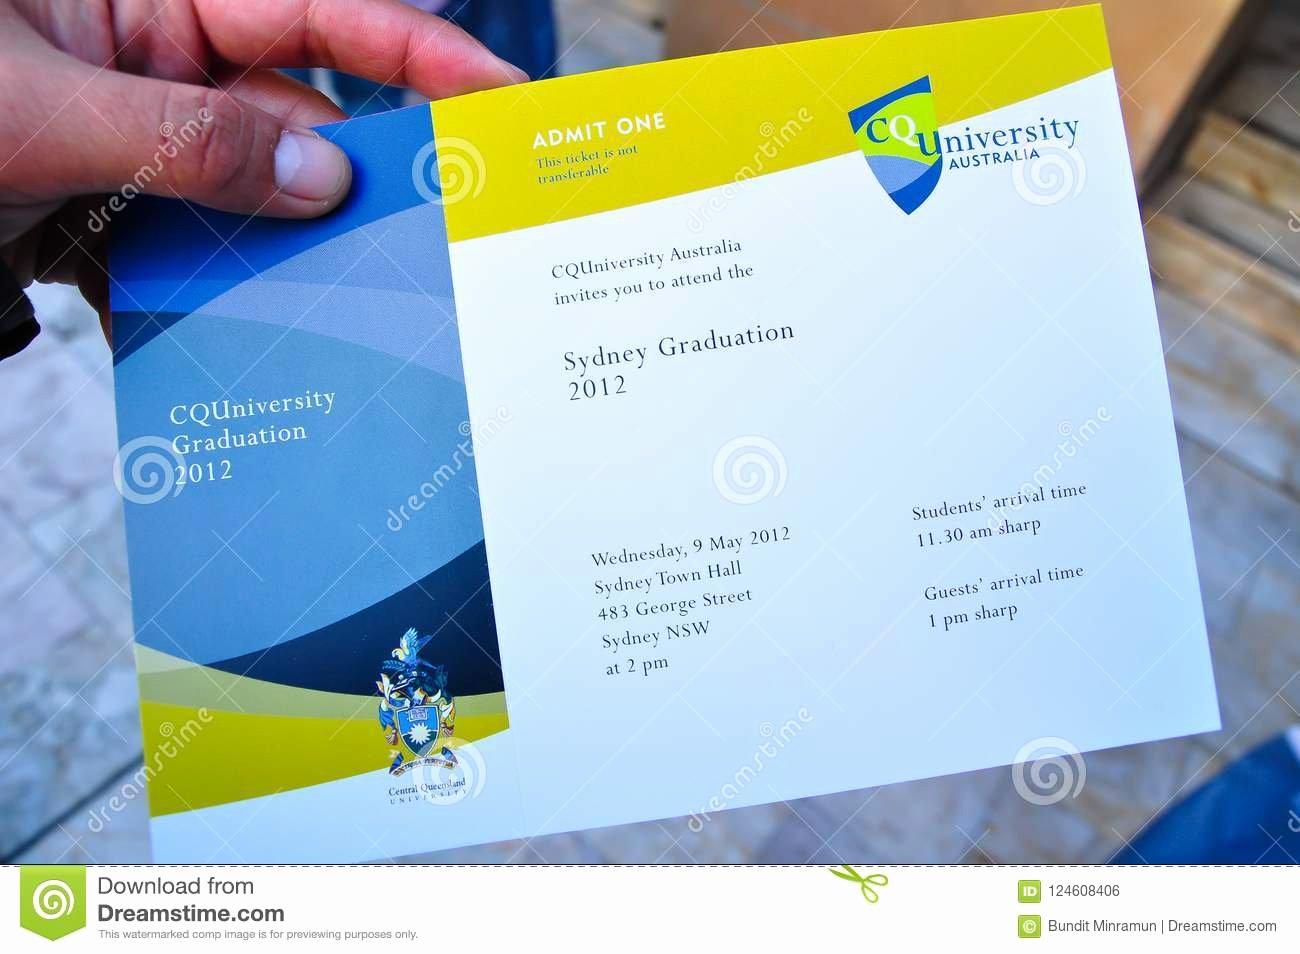 Graduation Ceremony Invitation Card Inspirational Central Queensland University Invitation Card for